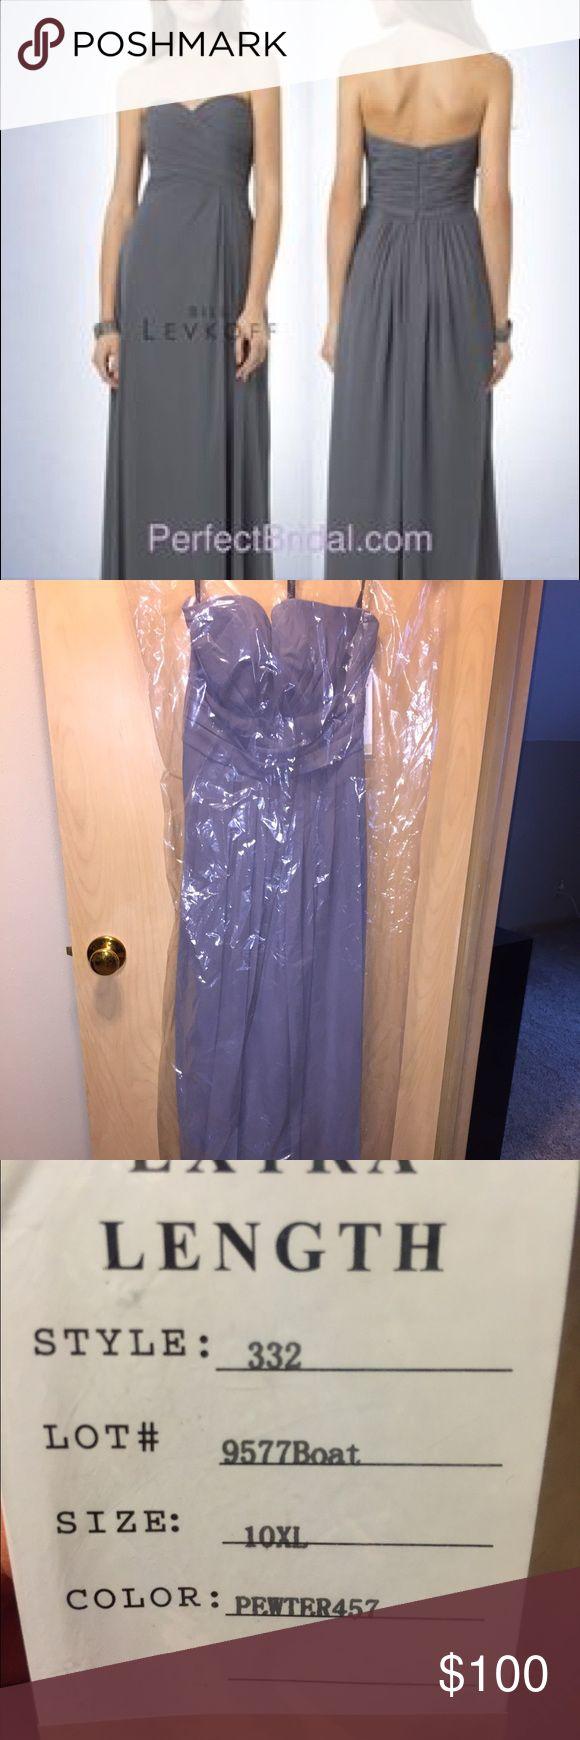 Bill Levkoff pewter bridesmaid dress Never worn! Wedding was canceled, size 10 with extra length Bill Levkoff Dresses Wedding